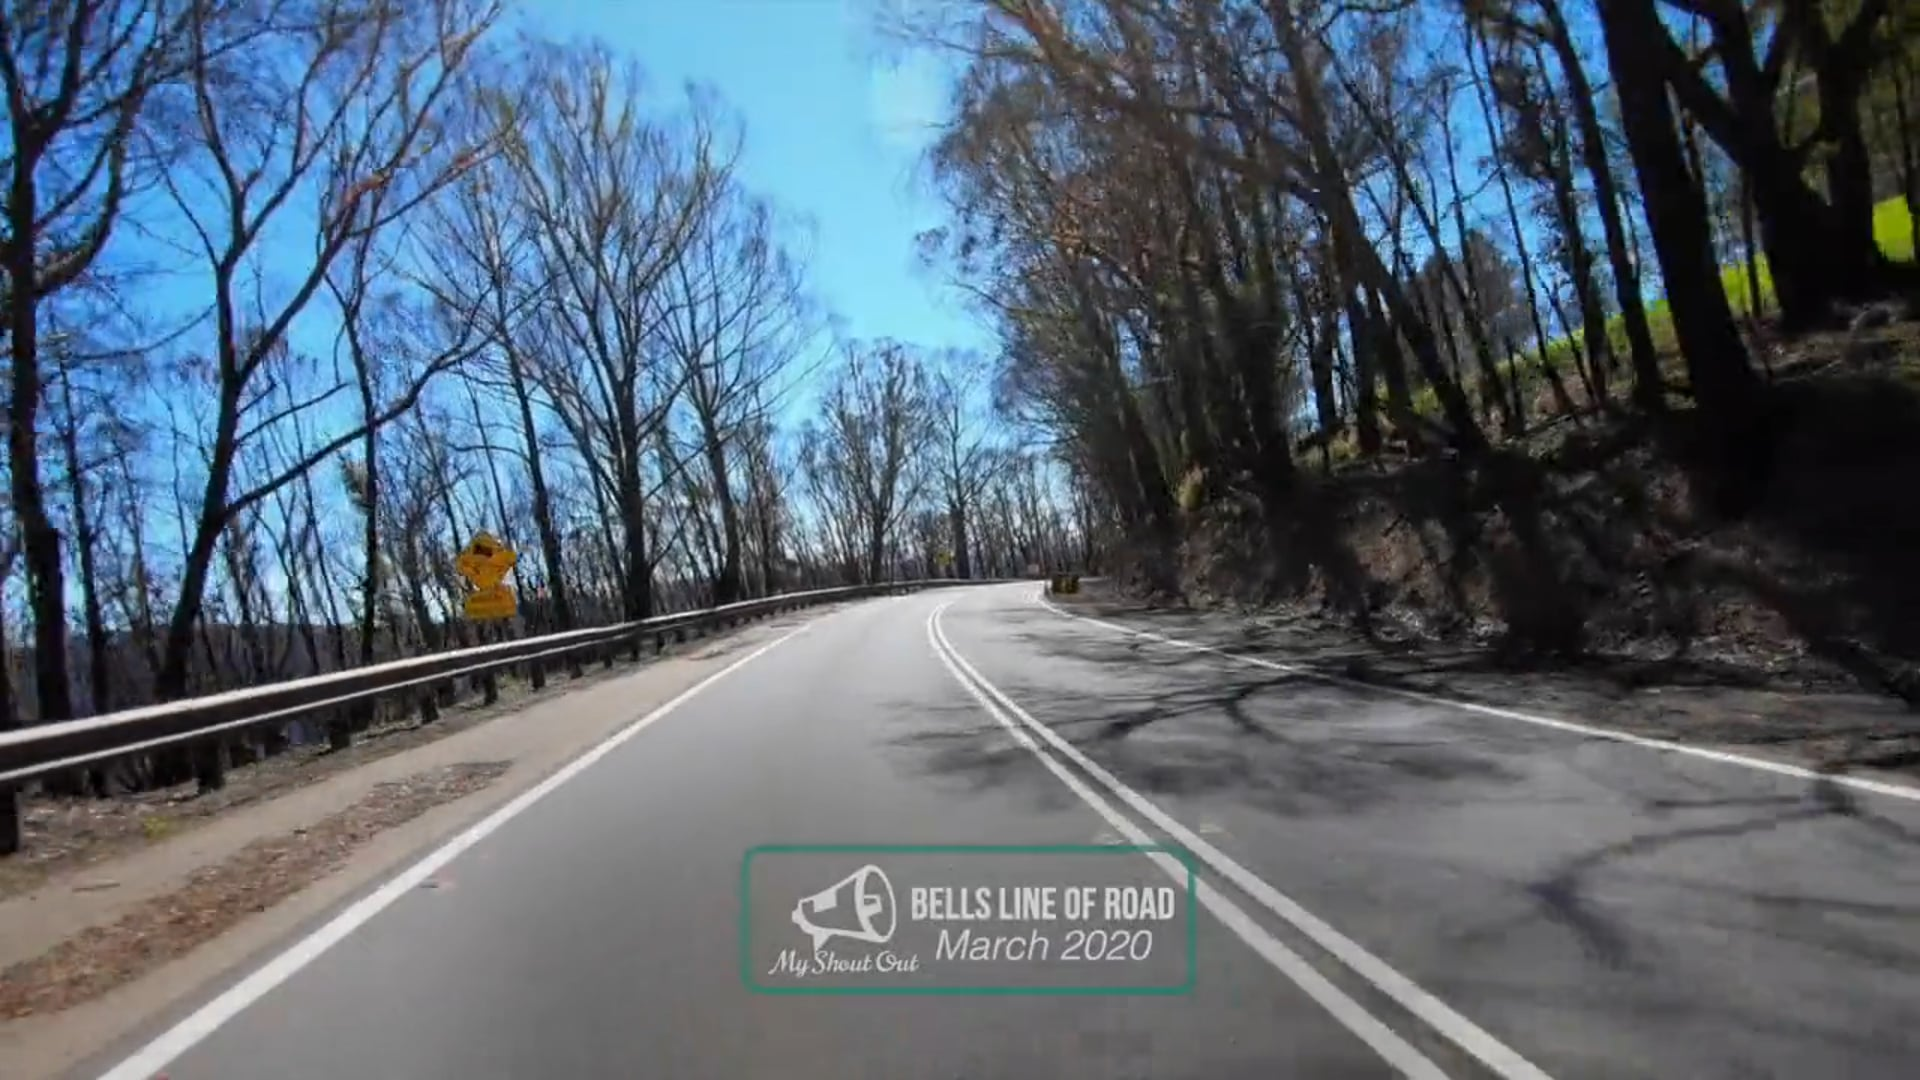 Drive Through Bells Line of Road - Bilpin